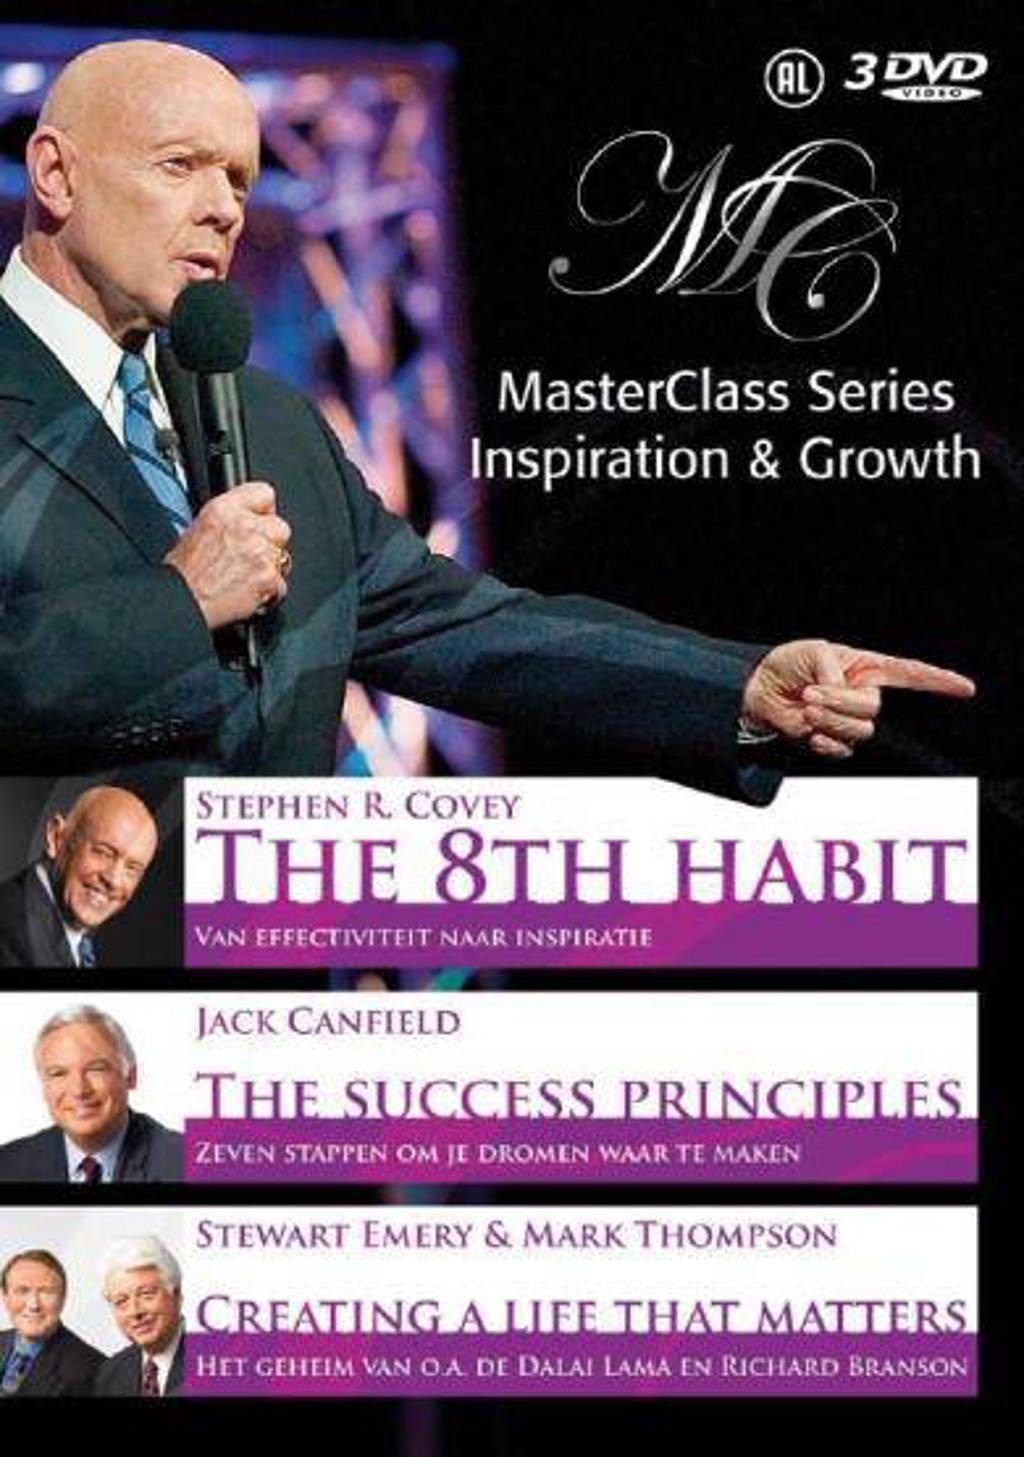 Masterclass series - Inspiration & growth (DVD)